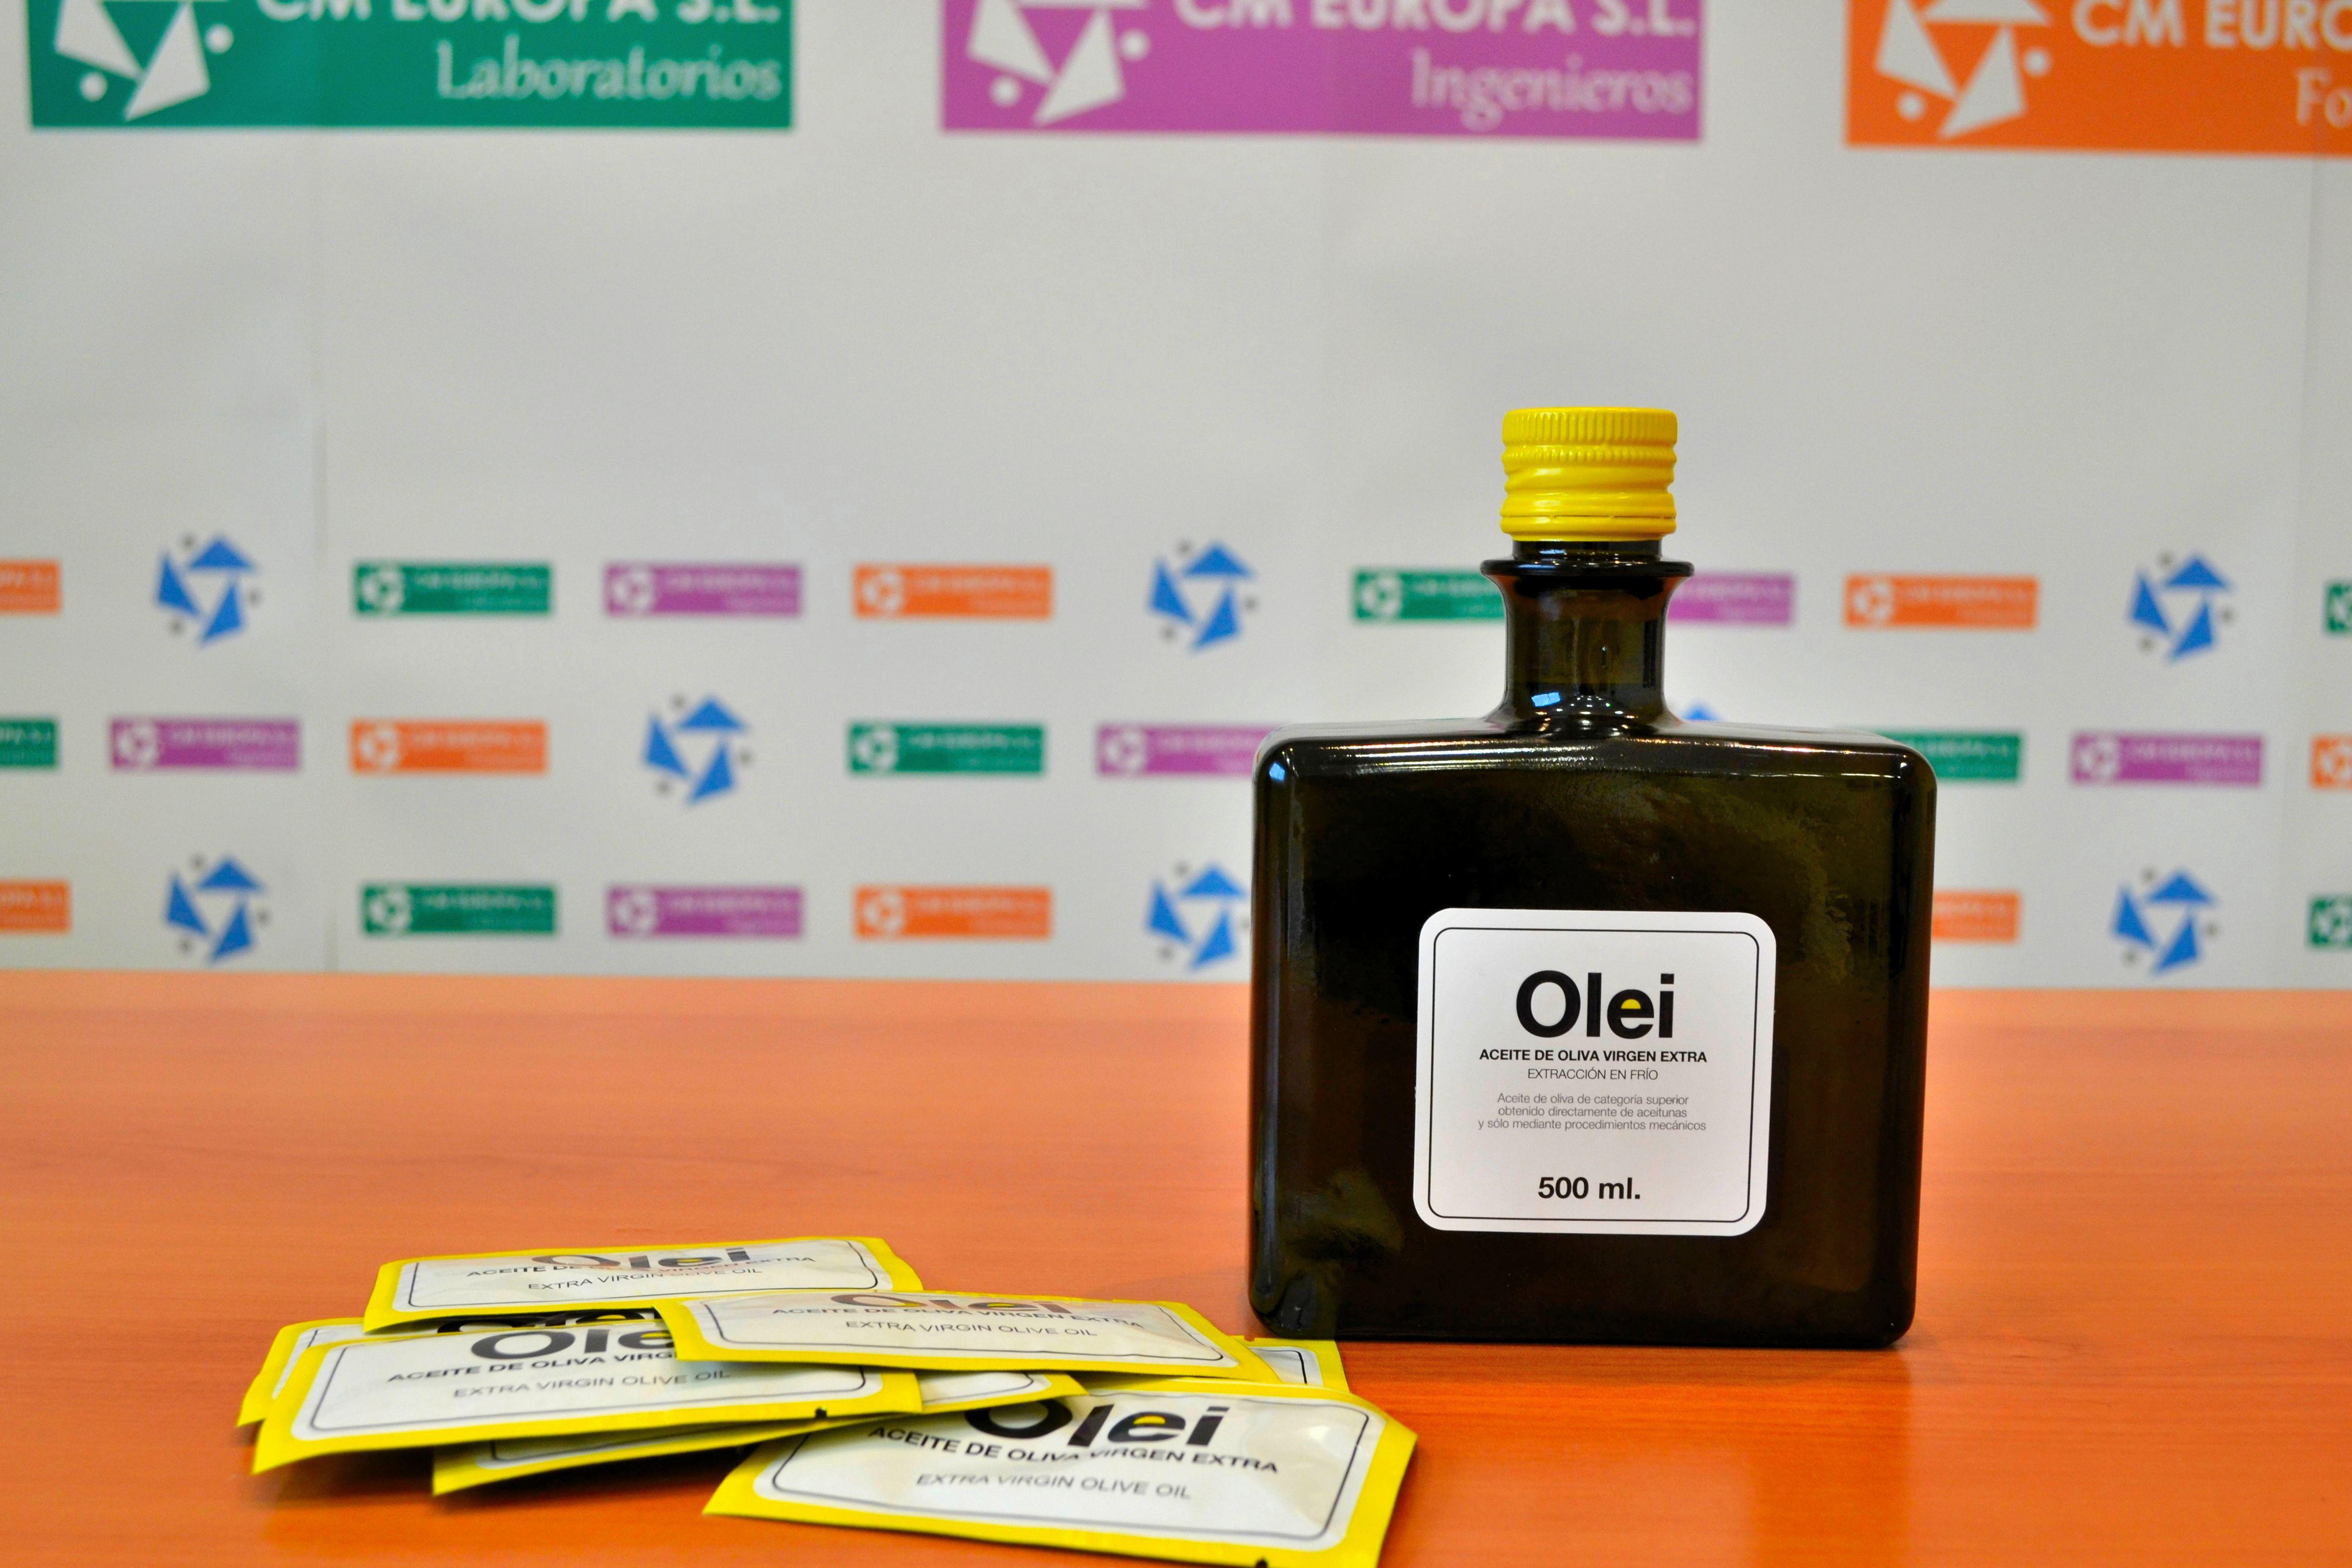 Aceite de Oliva Virgen Extra presente en #Twittsandaove 2013 de la variedad Brava Gallega